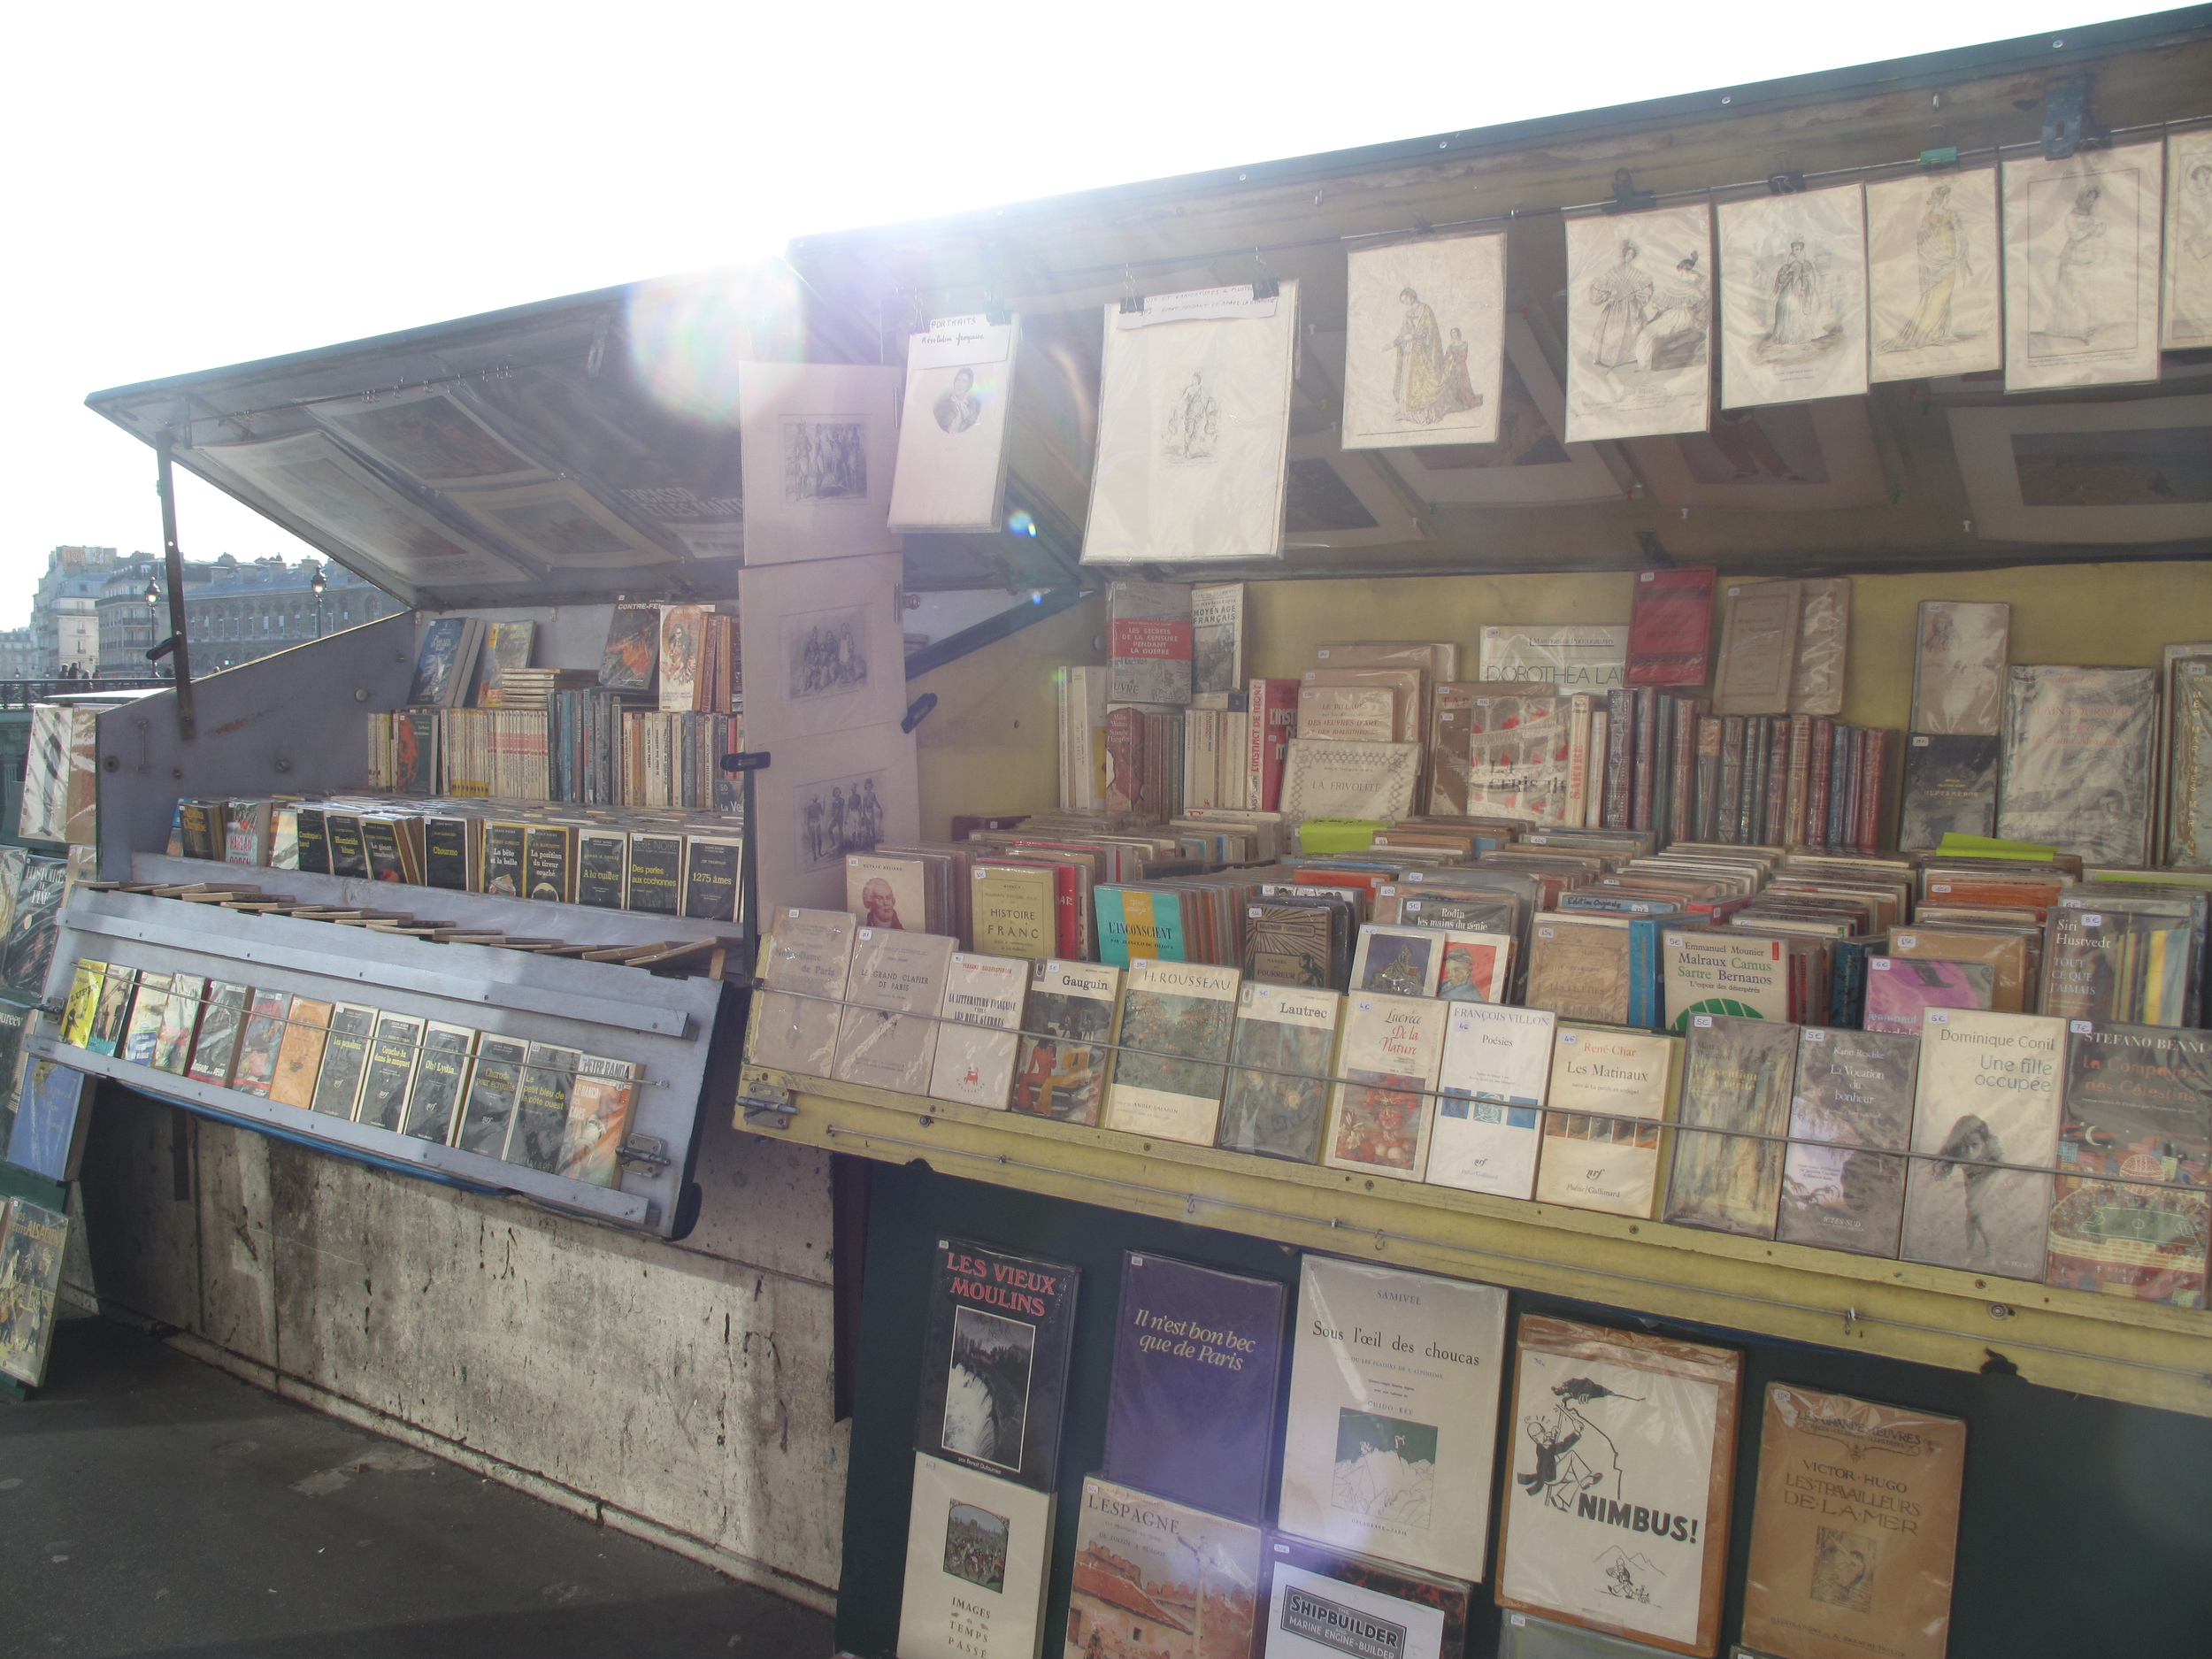 Bouquinistes - bookstalls on the quai of the Left Bank, Paris.